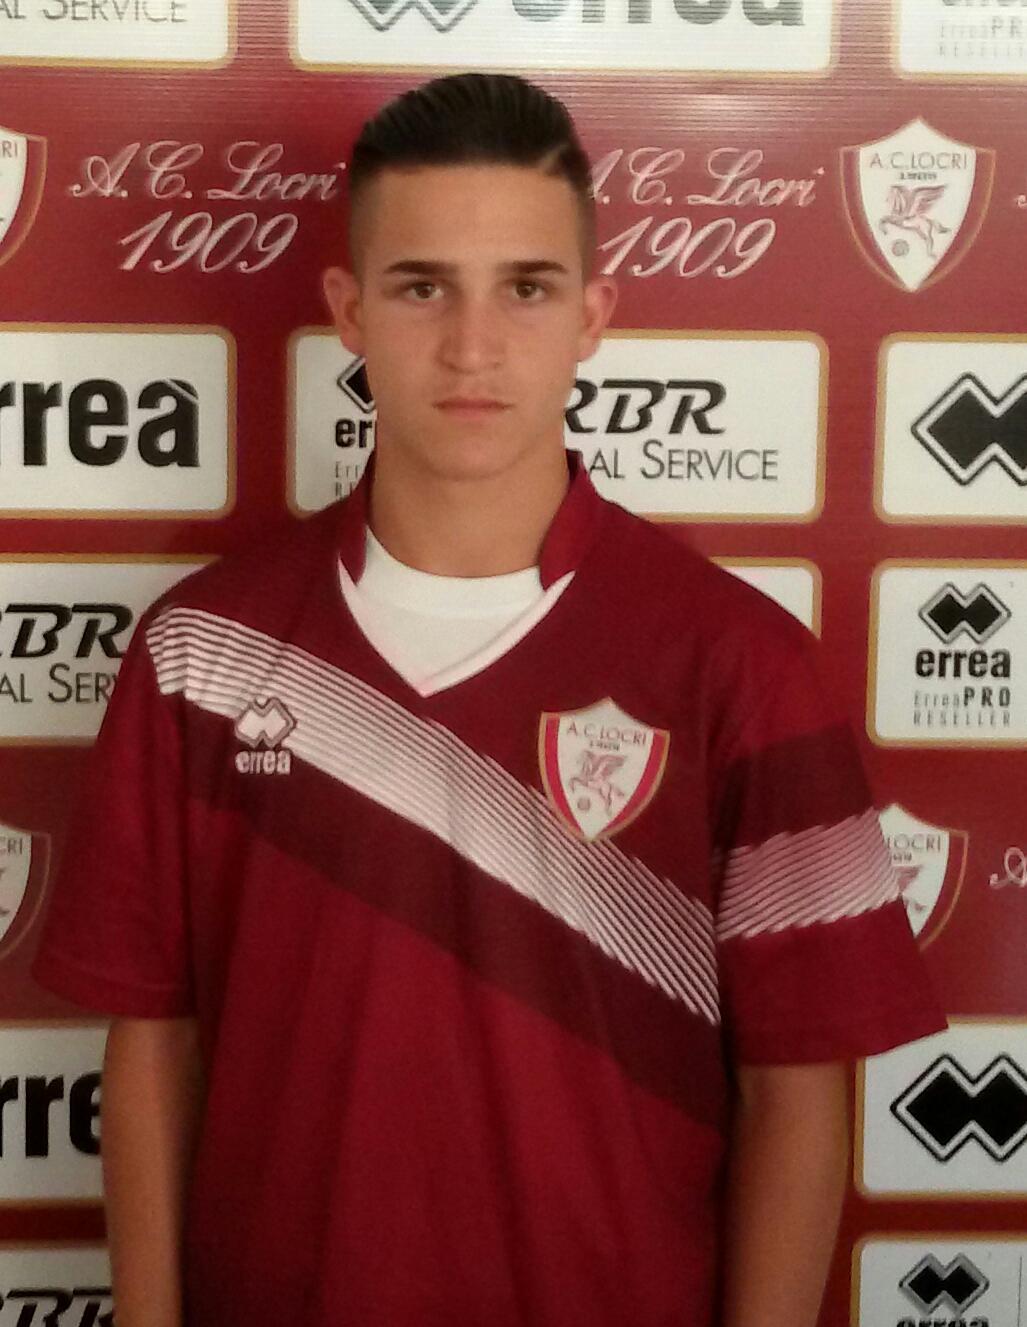 Emanuele Annunziata Locri